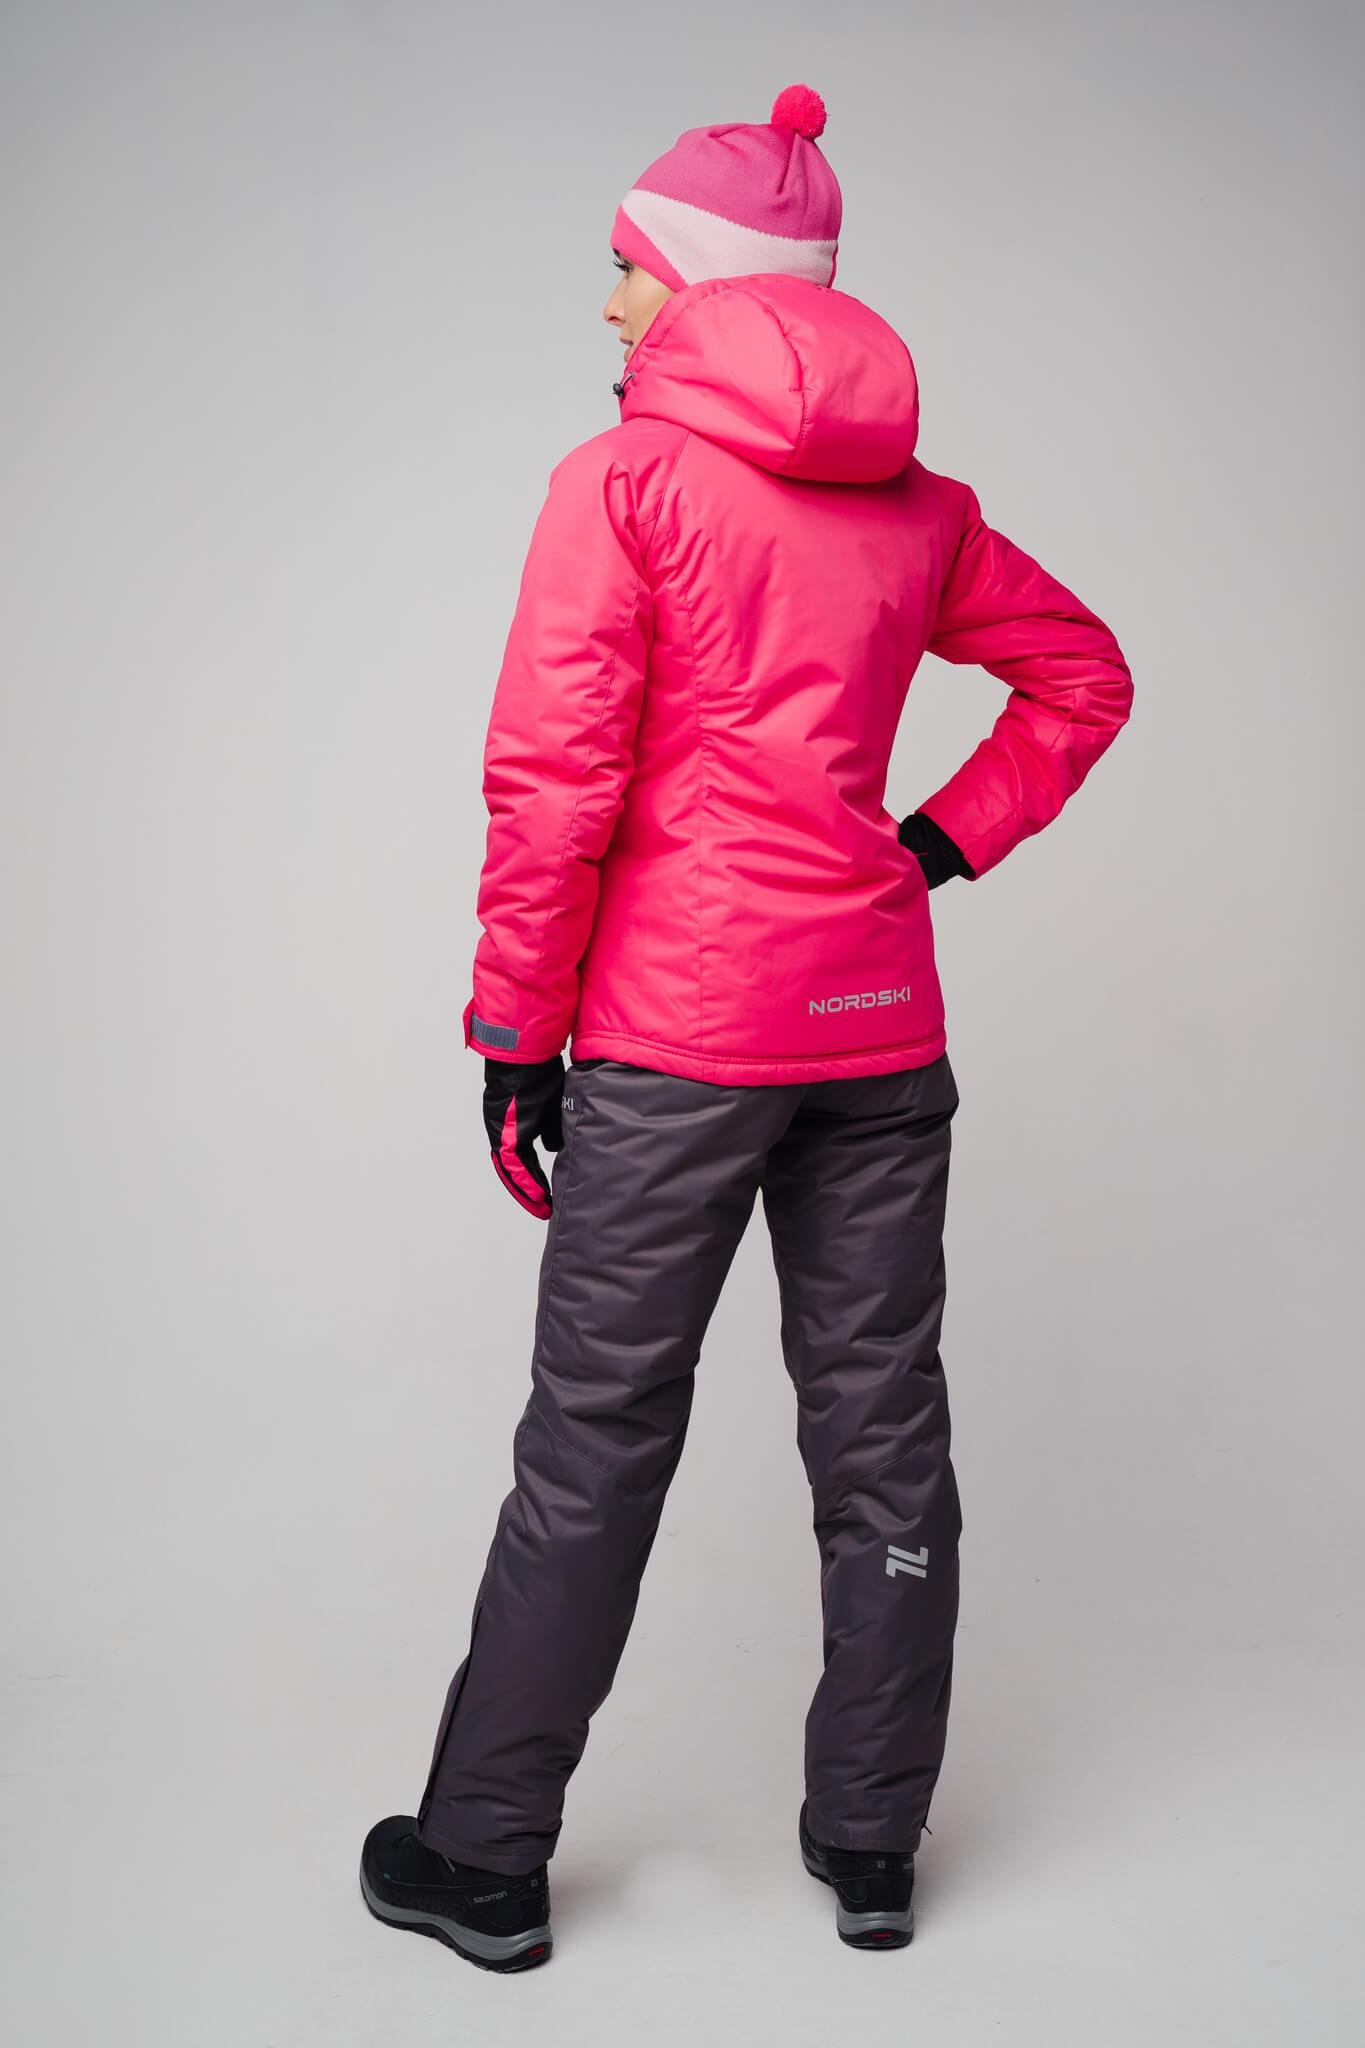 Nordski Motion женский прогулочный костюм raspberry-grey - 2